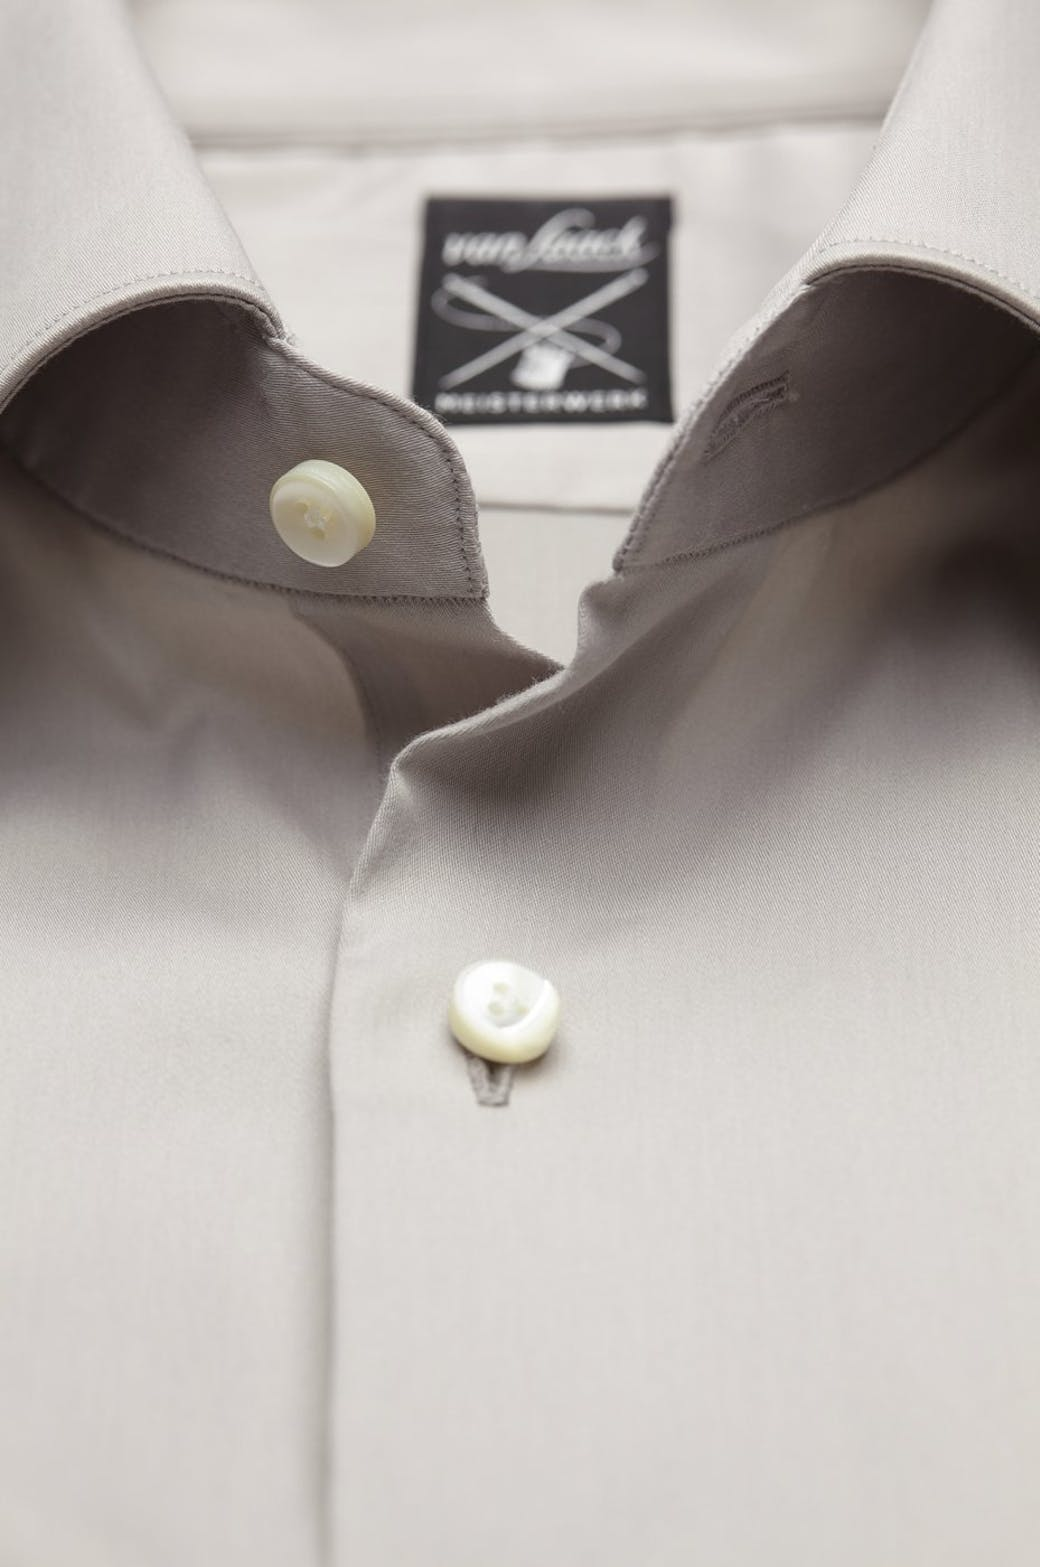 pflege-guide: hemdkragen reinigen